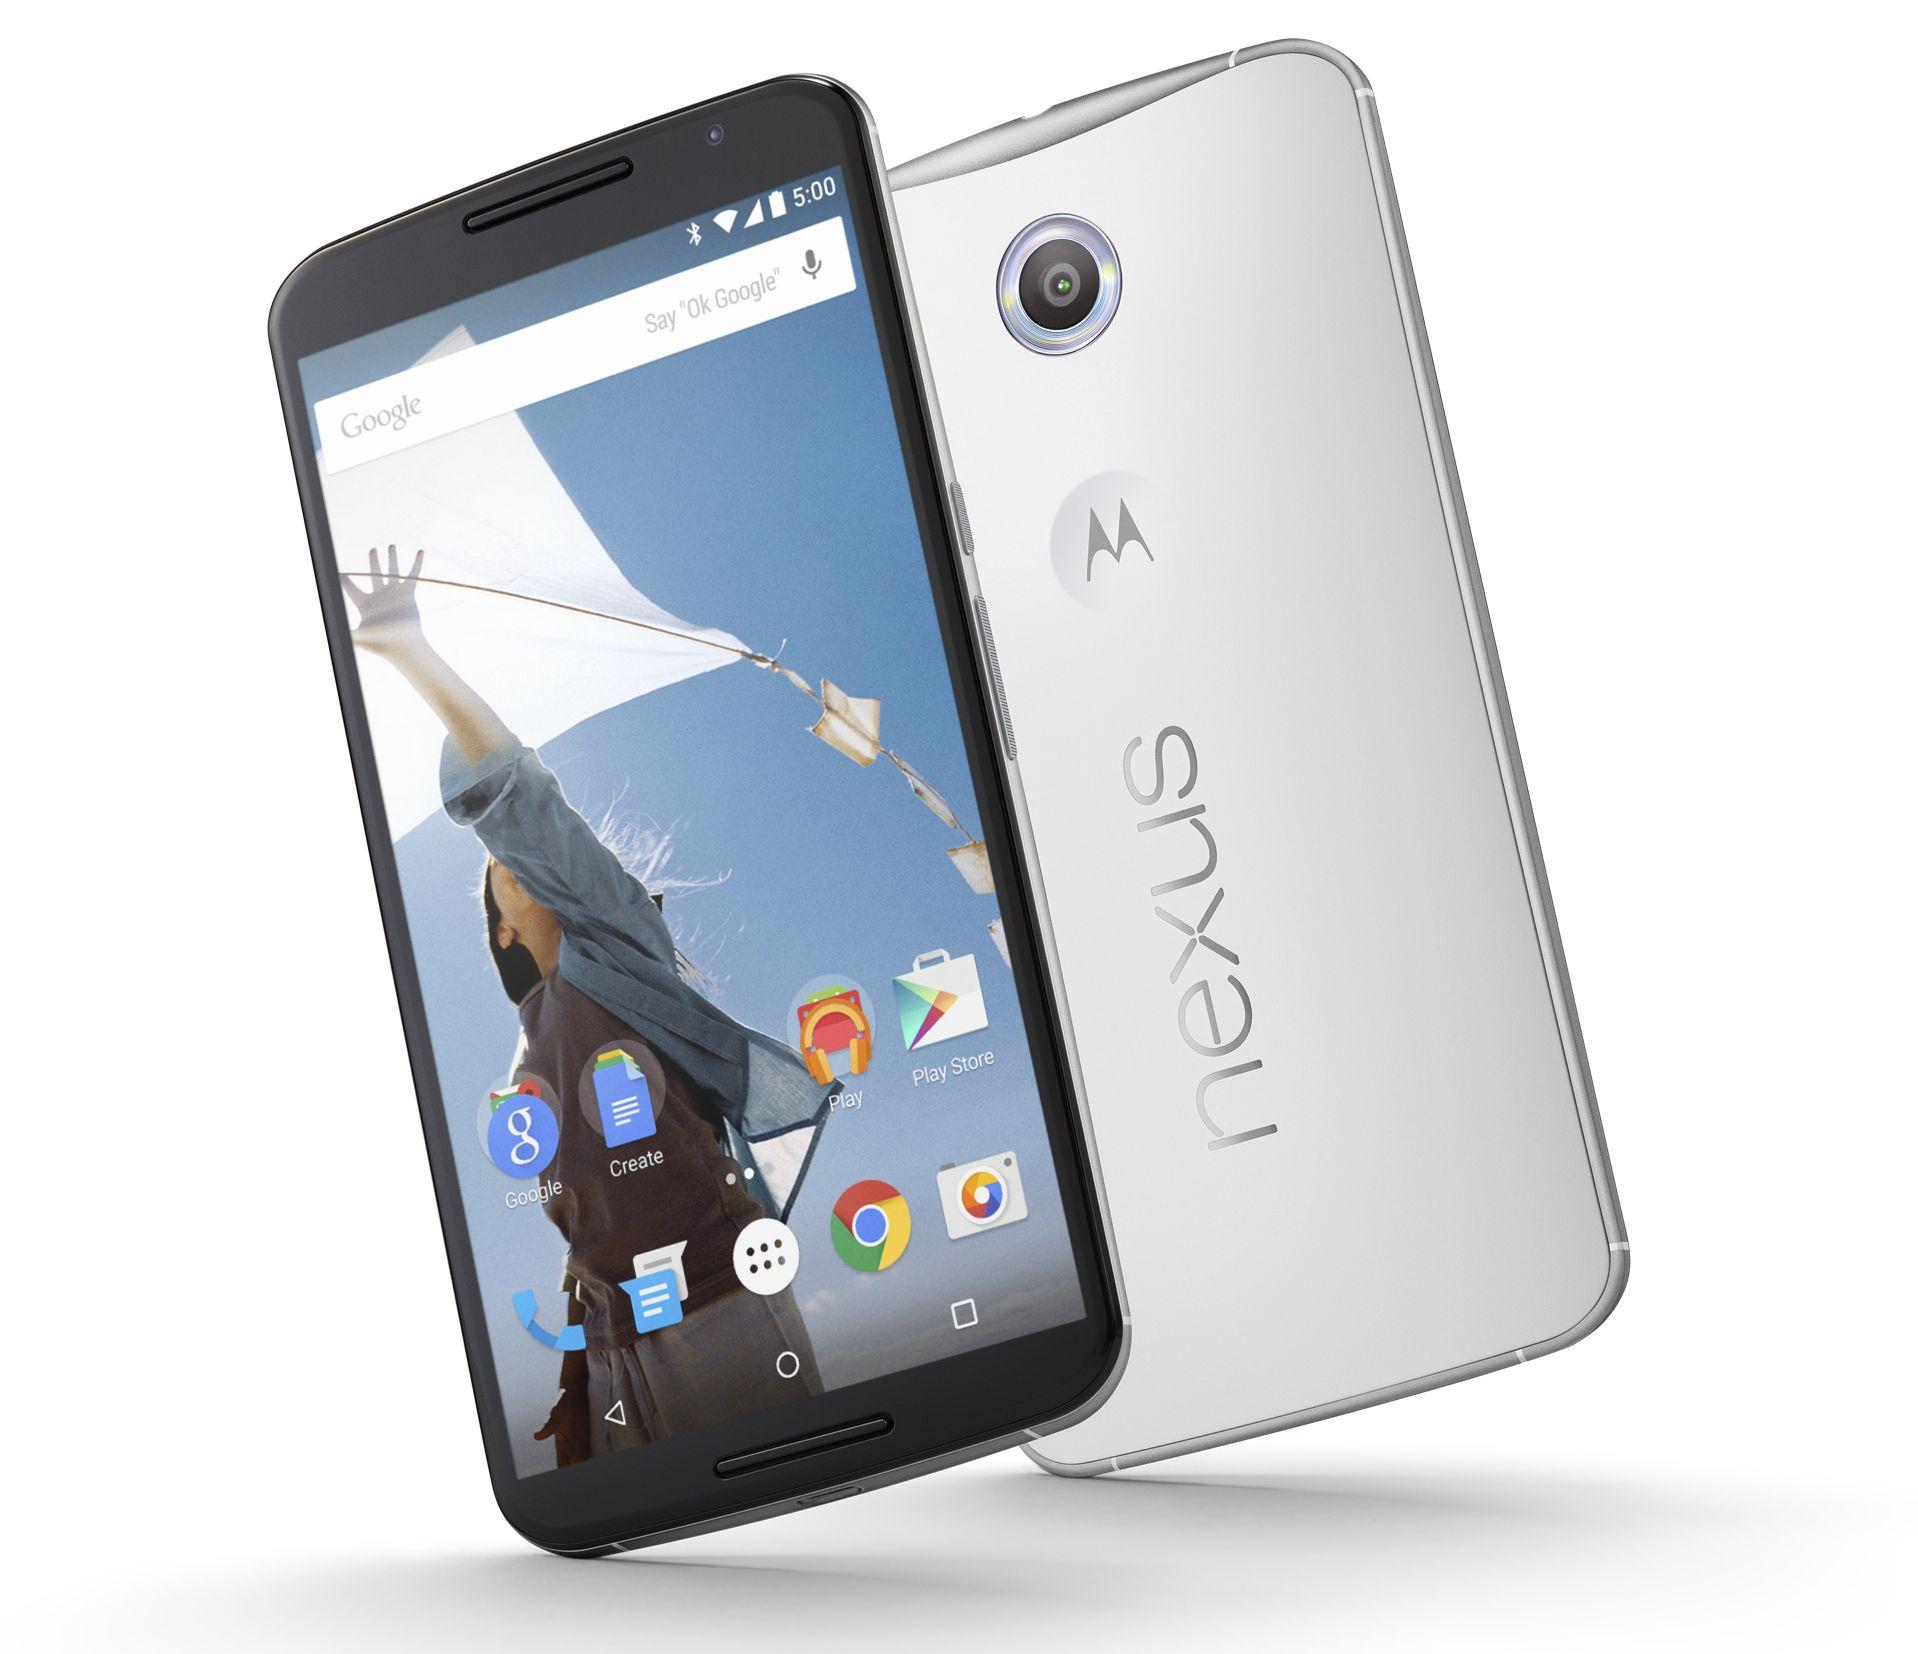 Nexus 6-od van? Akkor ez érdekelni fog!